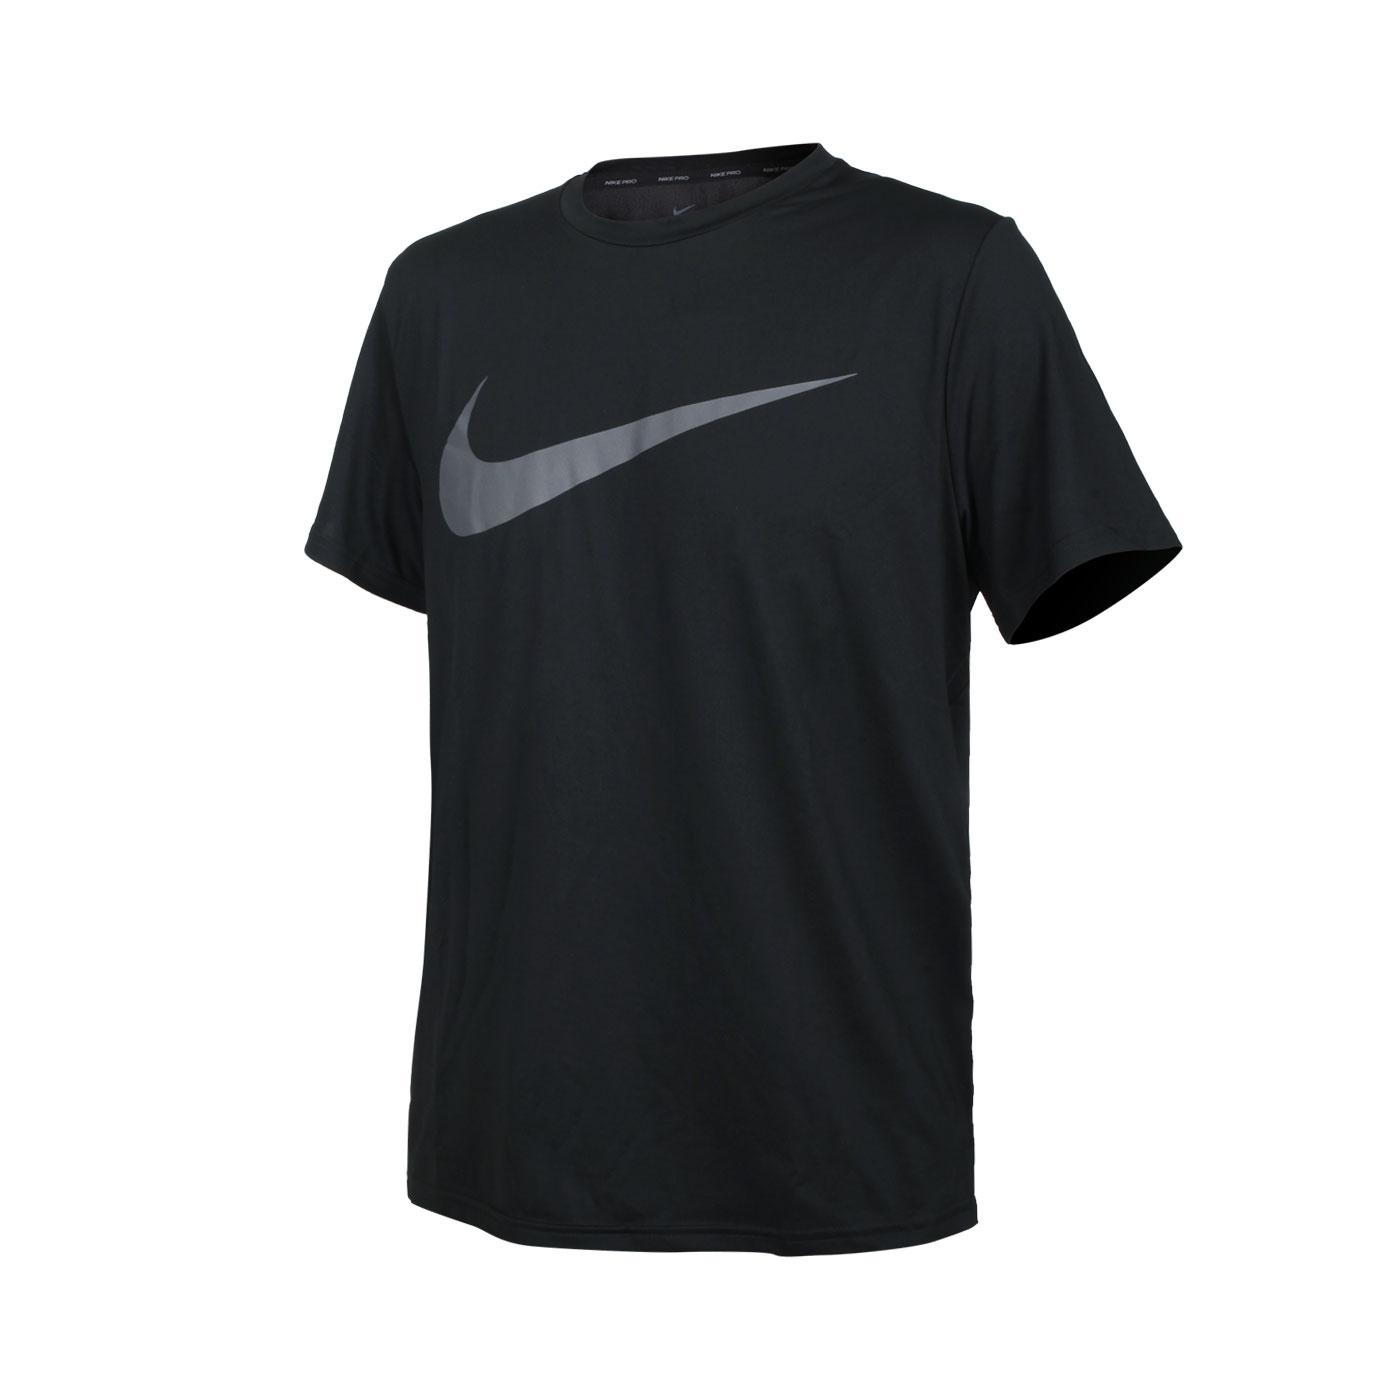 NIKE 男款短袖T恤 CZ2418-010